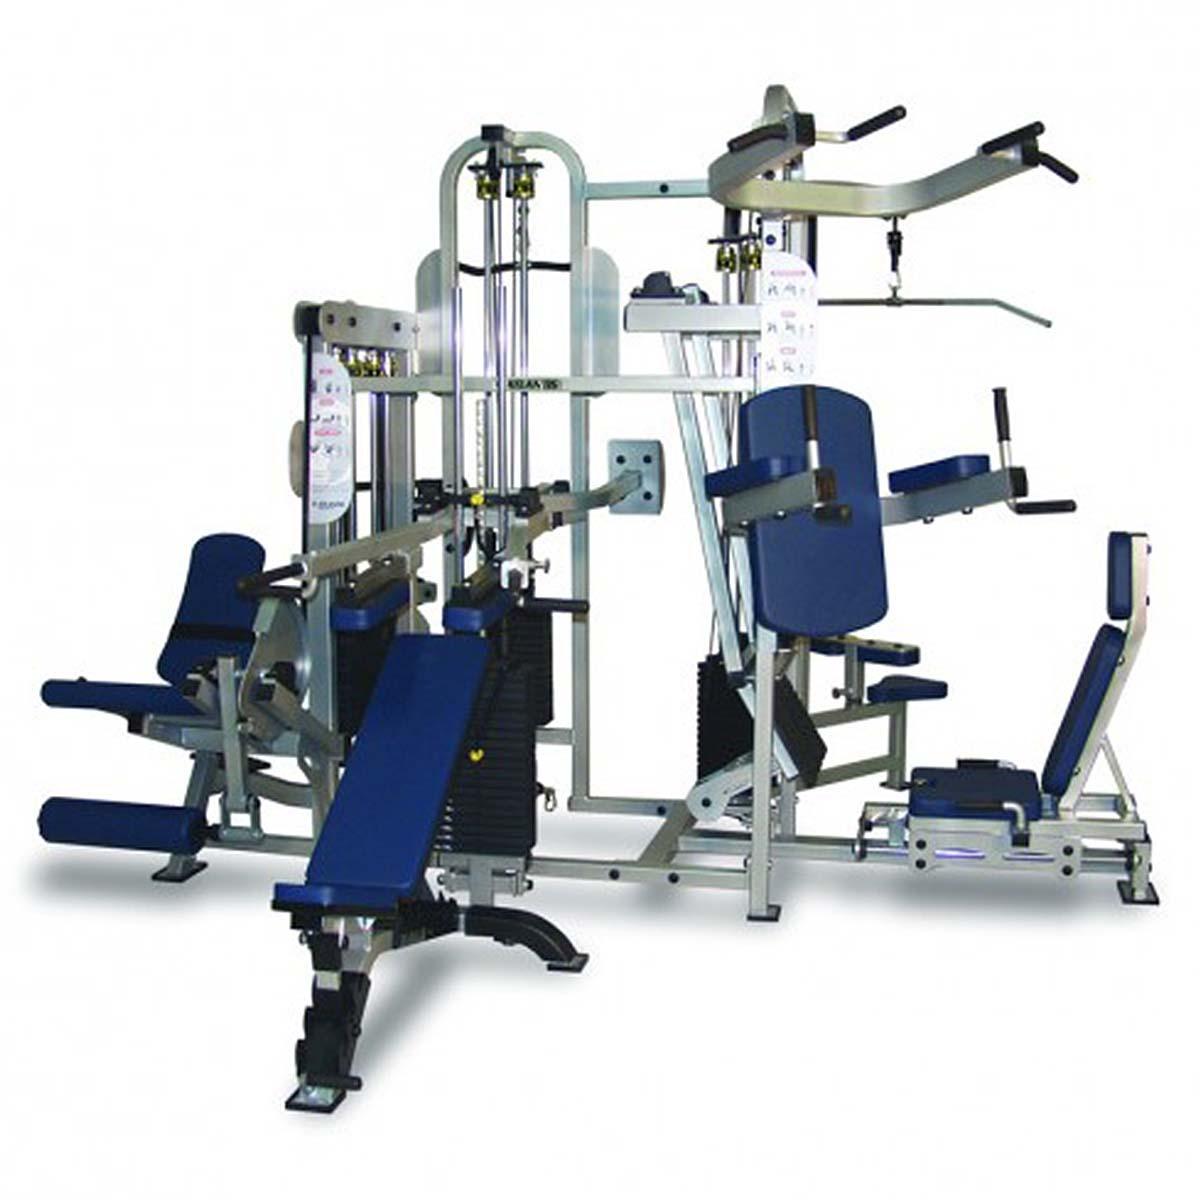 Richmond Strength Equipment - Multi Stations - Lifestyle Equipment